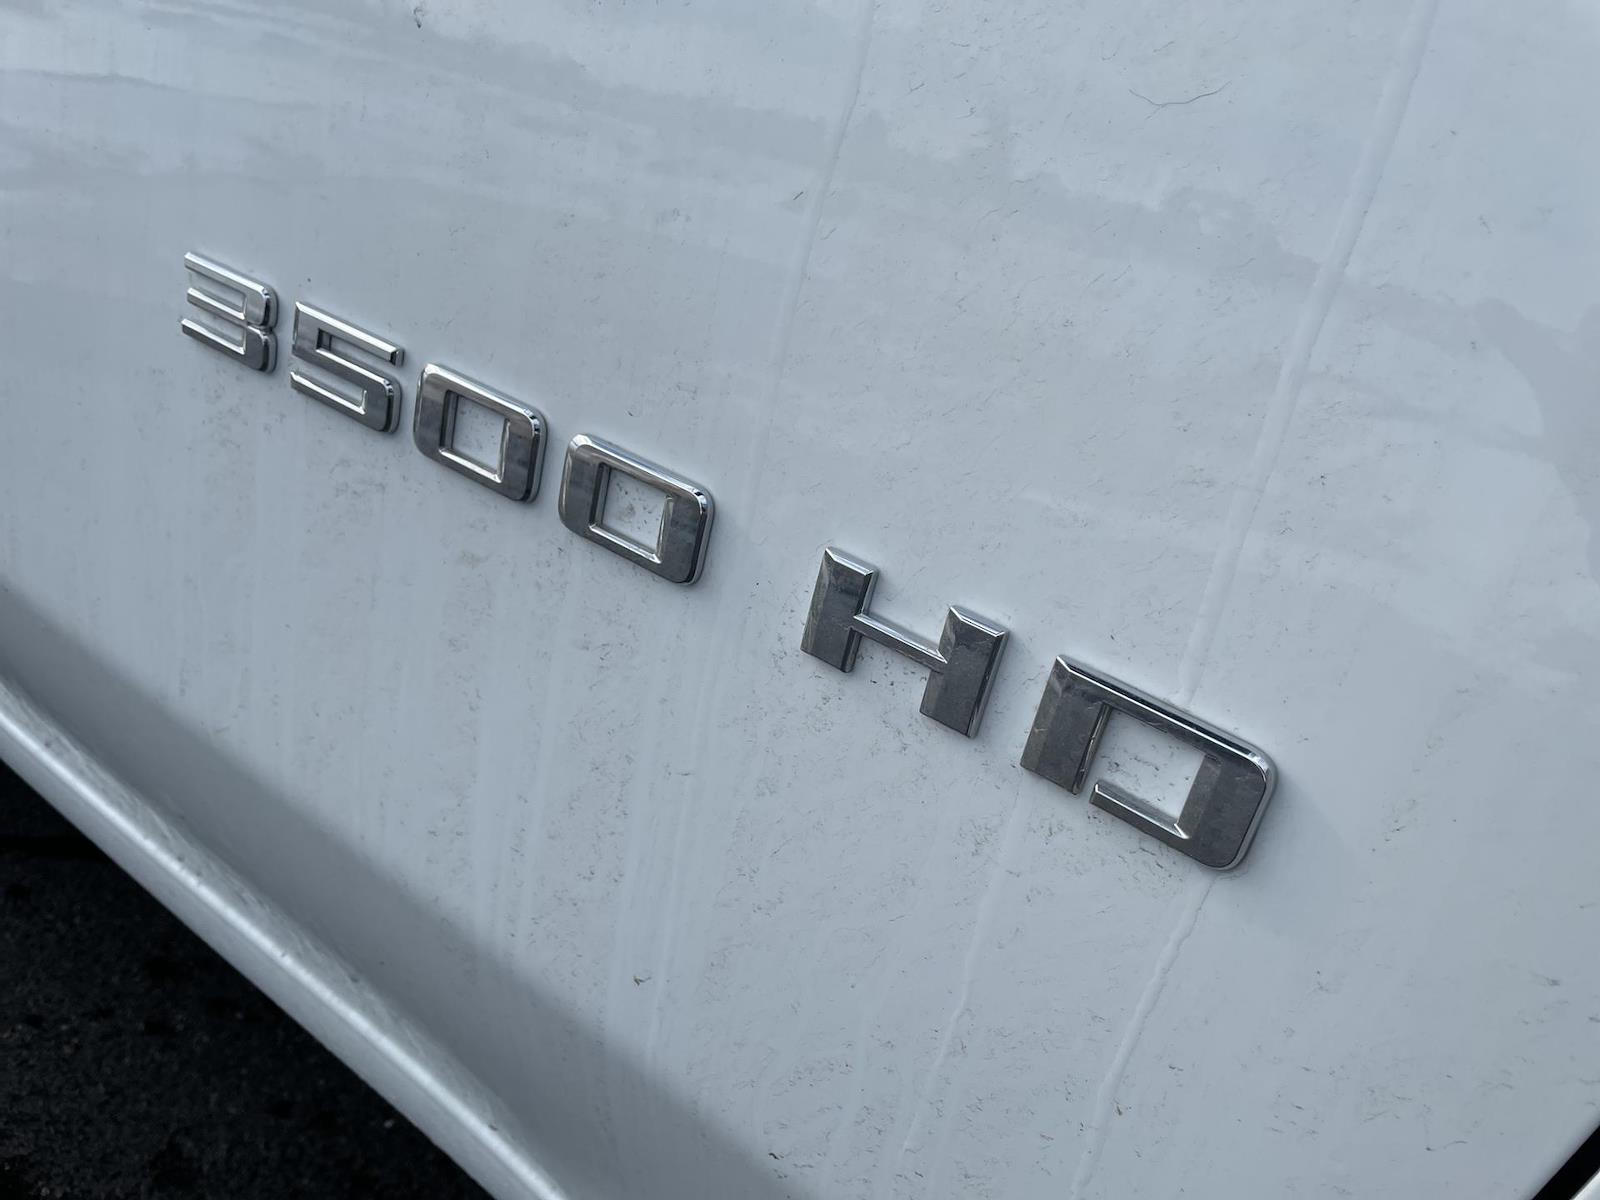 2021 Chevrolet Silverado 3500 Regular Cab AWD, Knapheide PGND Gooseneck Hauler Body #143979 - photo 7